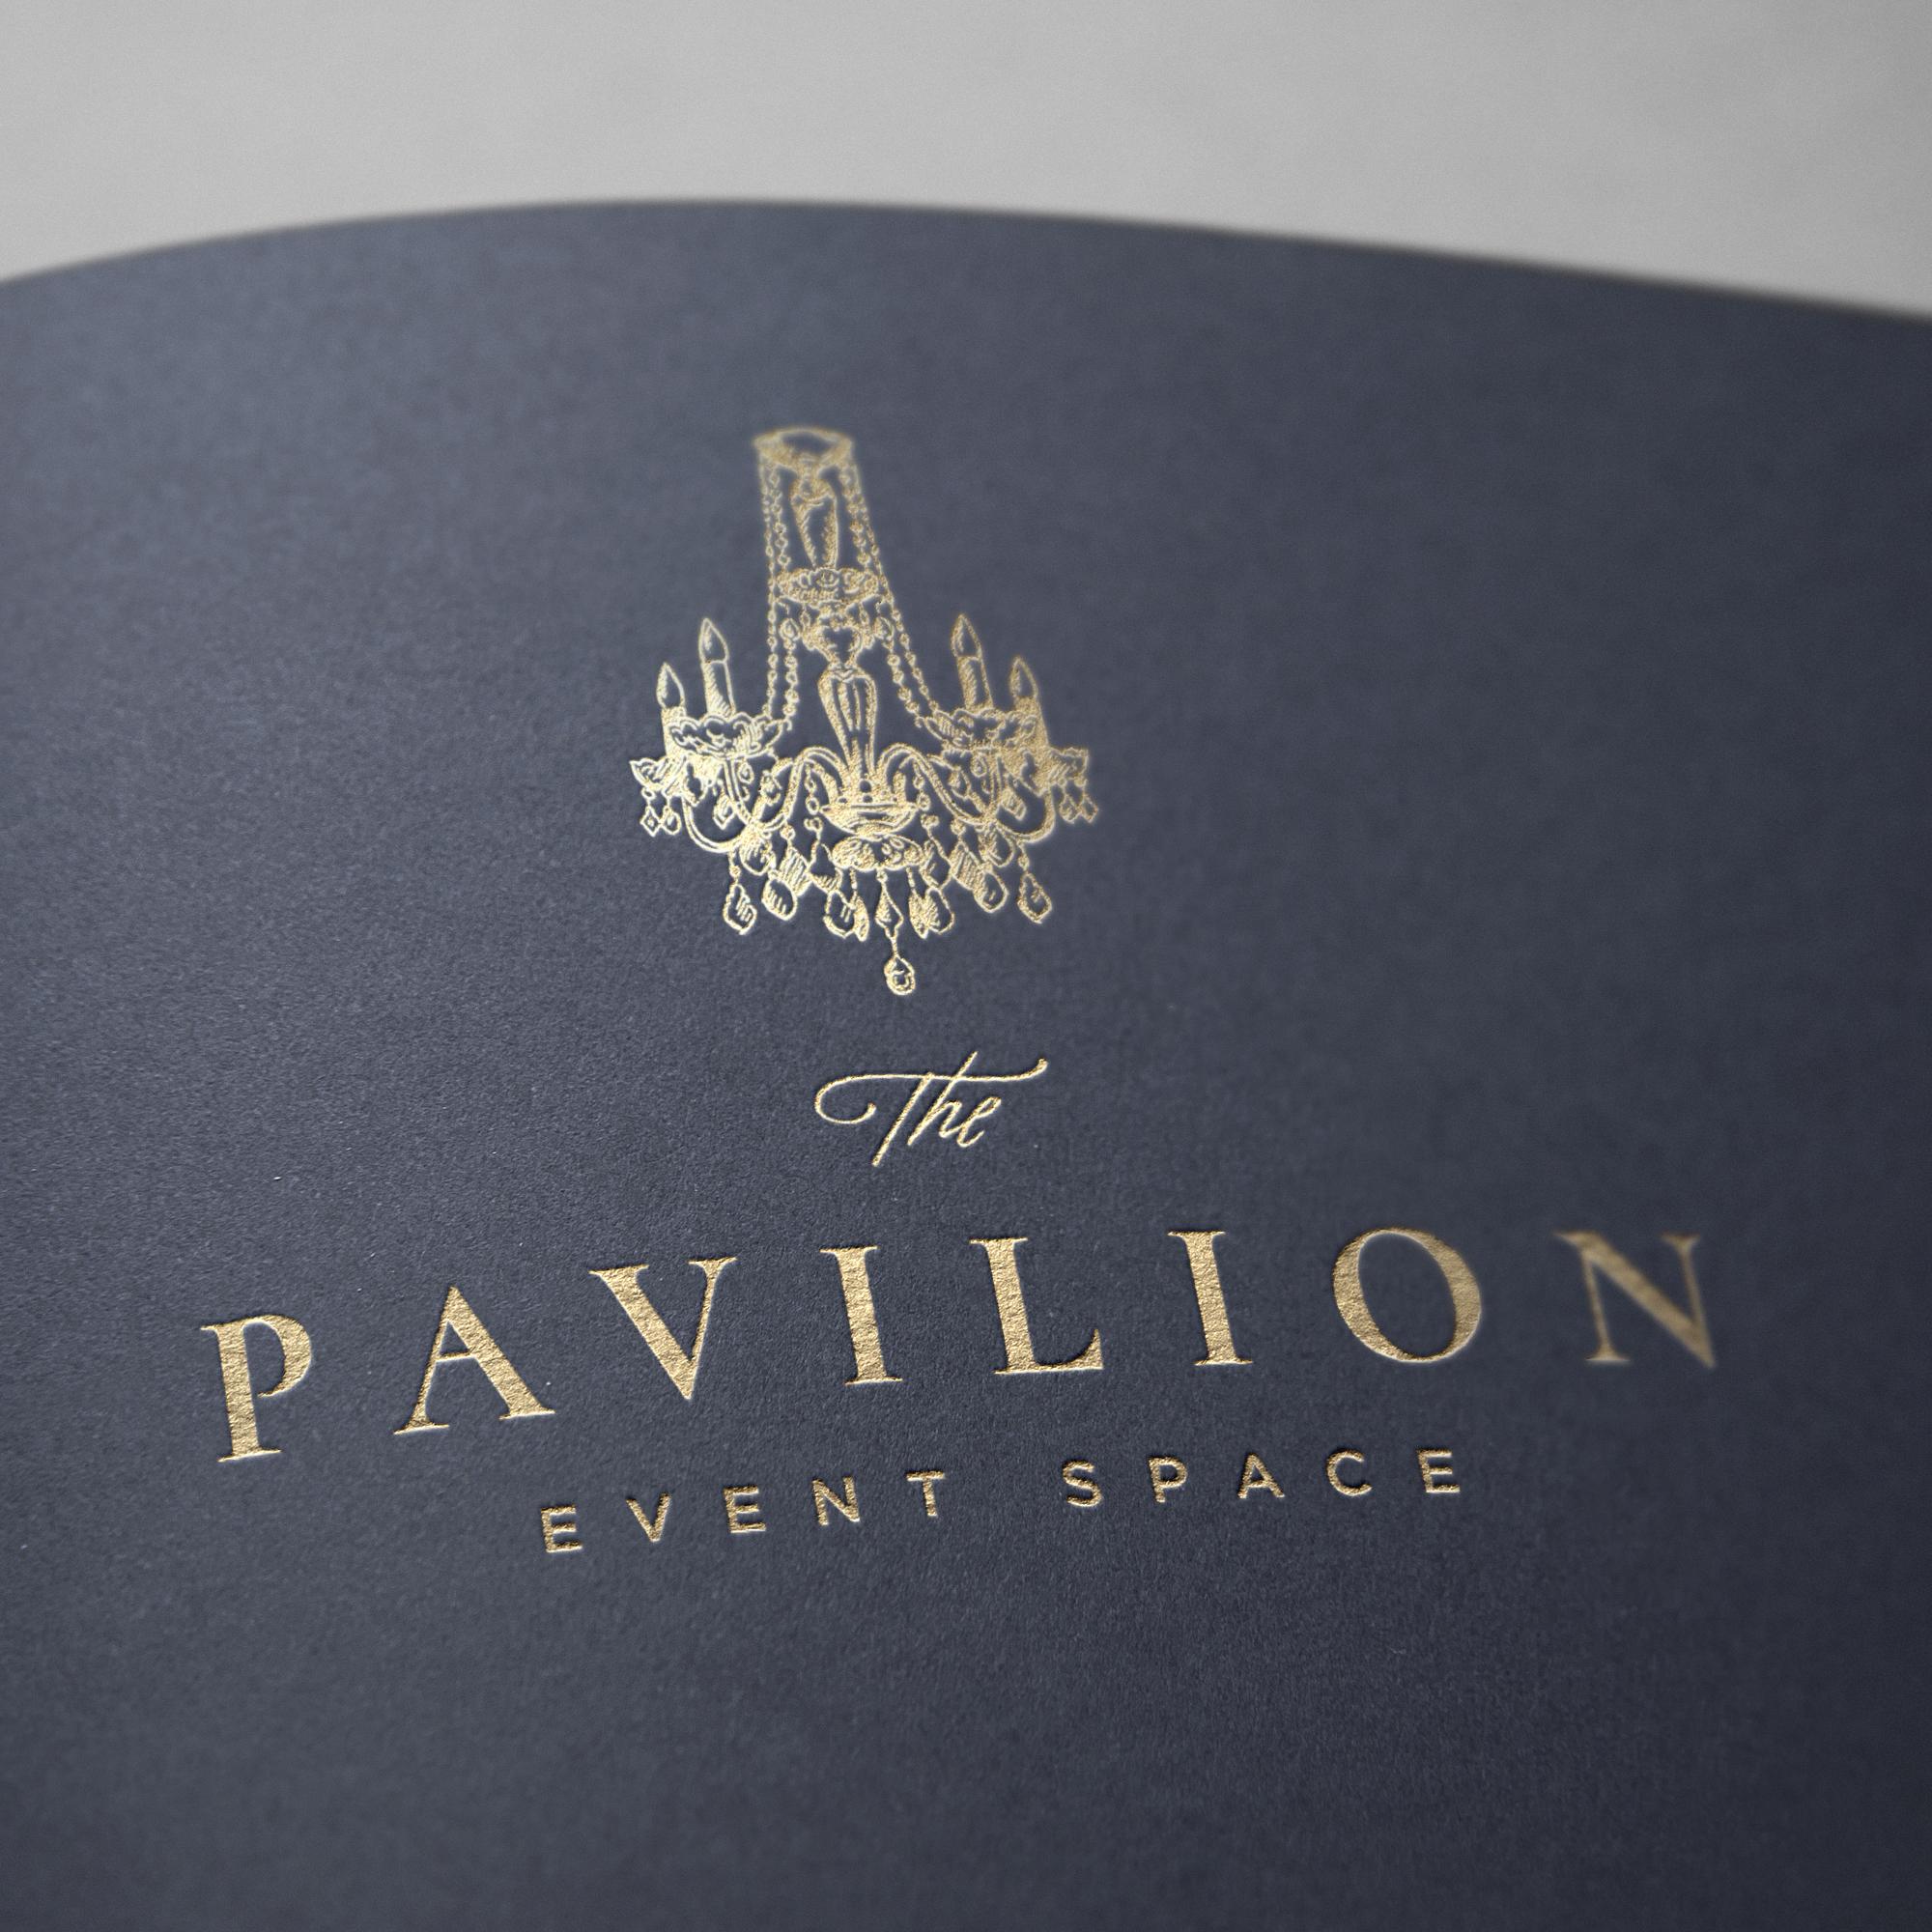 Calico Hill Creative Pavilion Event Space Logo Design 4